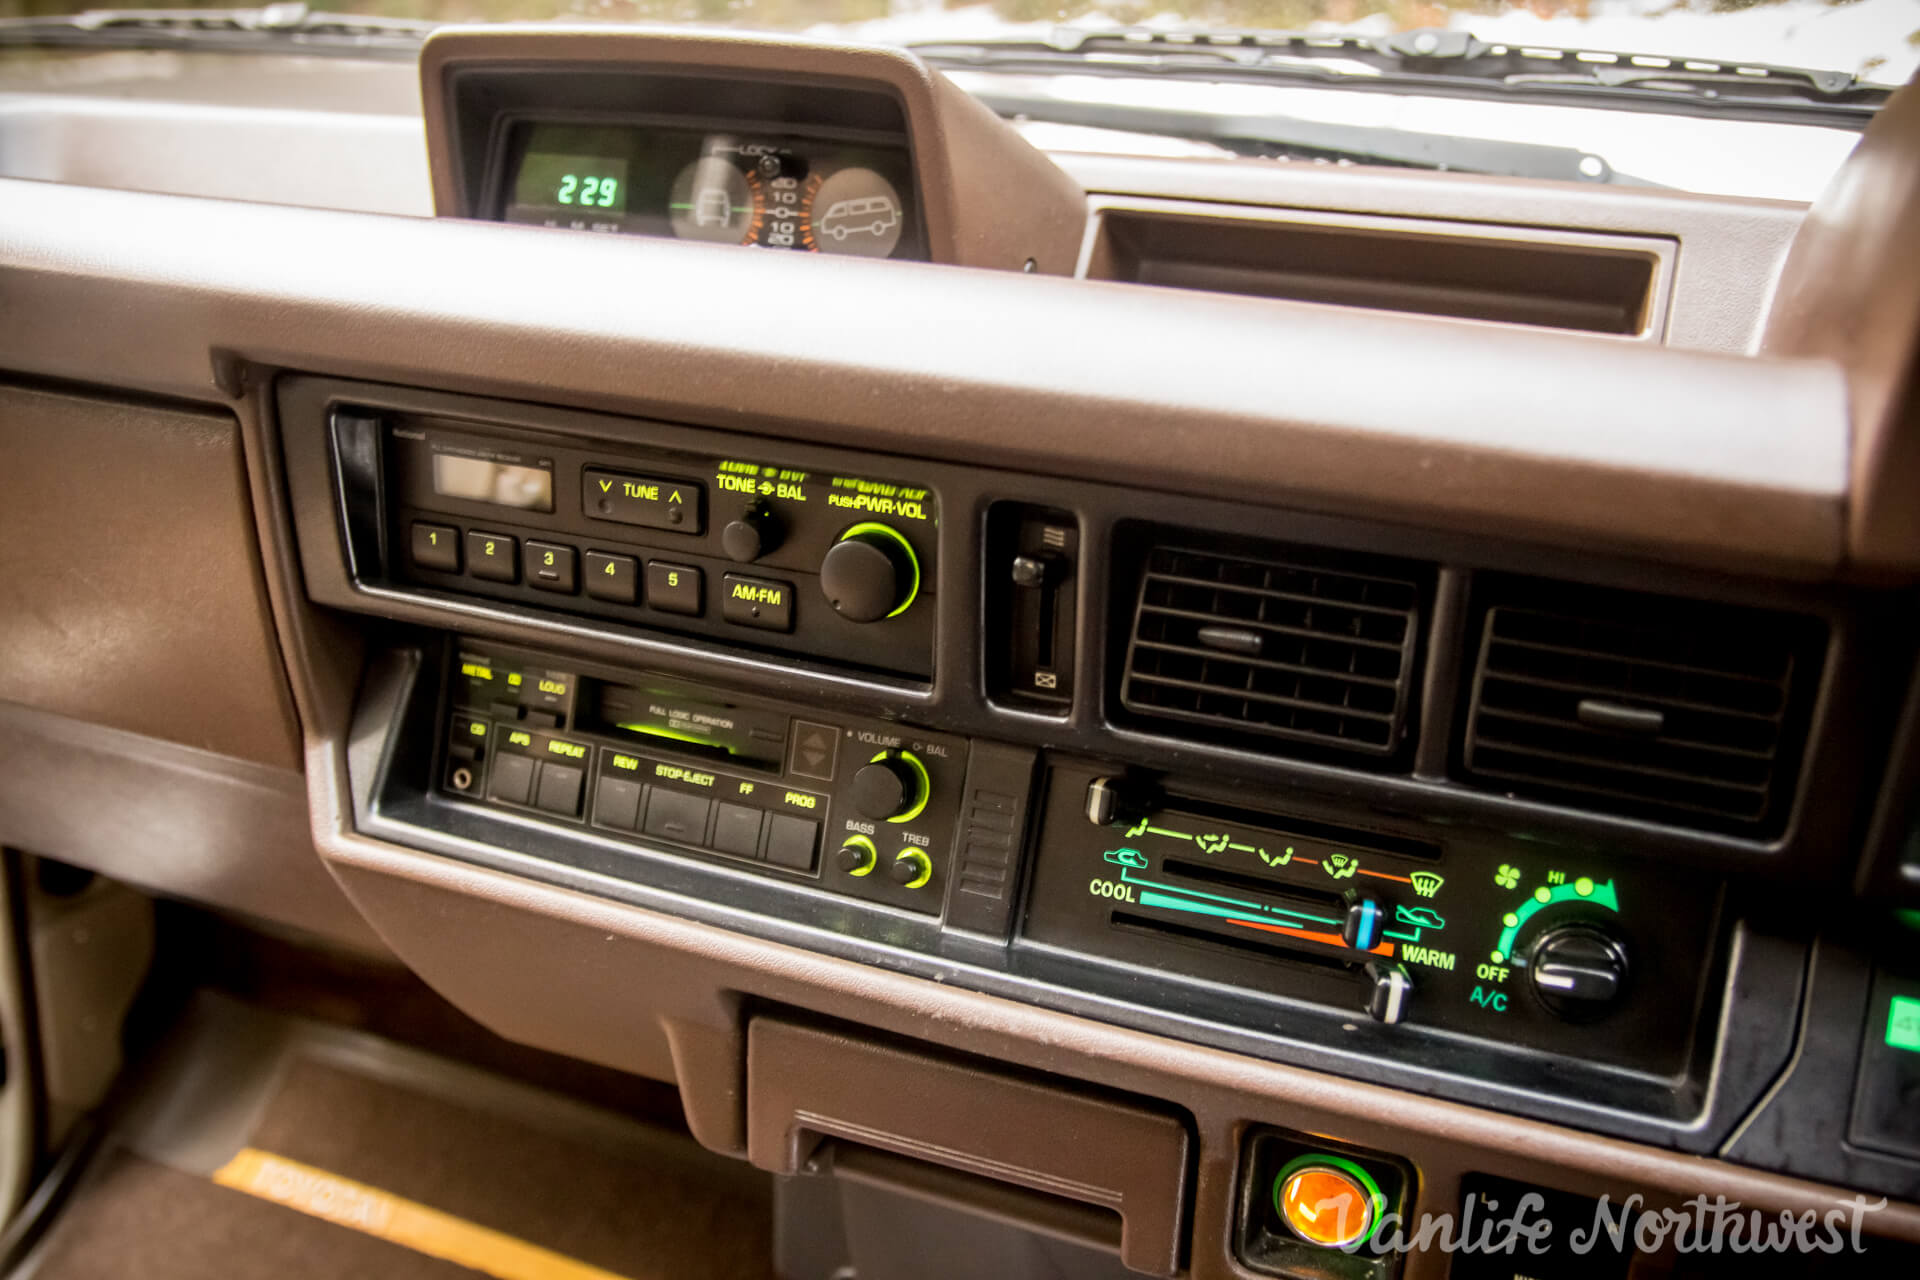 1988ToyotaLiteAceFXV4wdGasManual75k-32.jpg